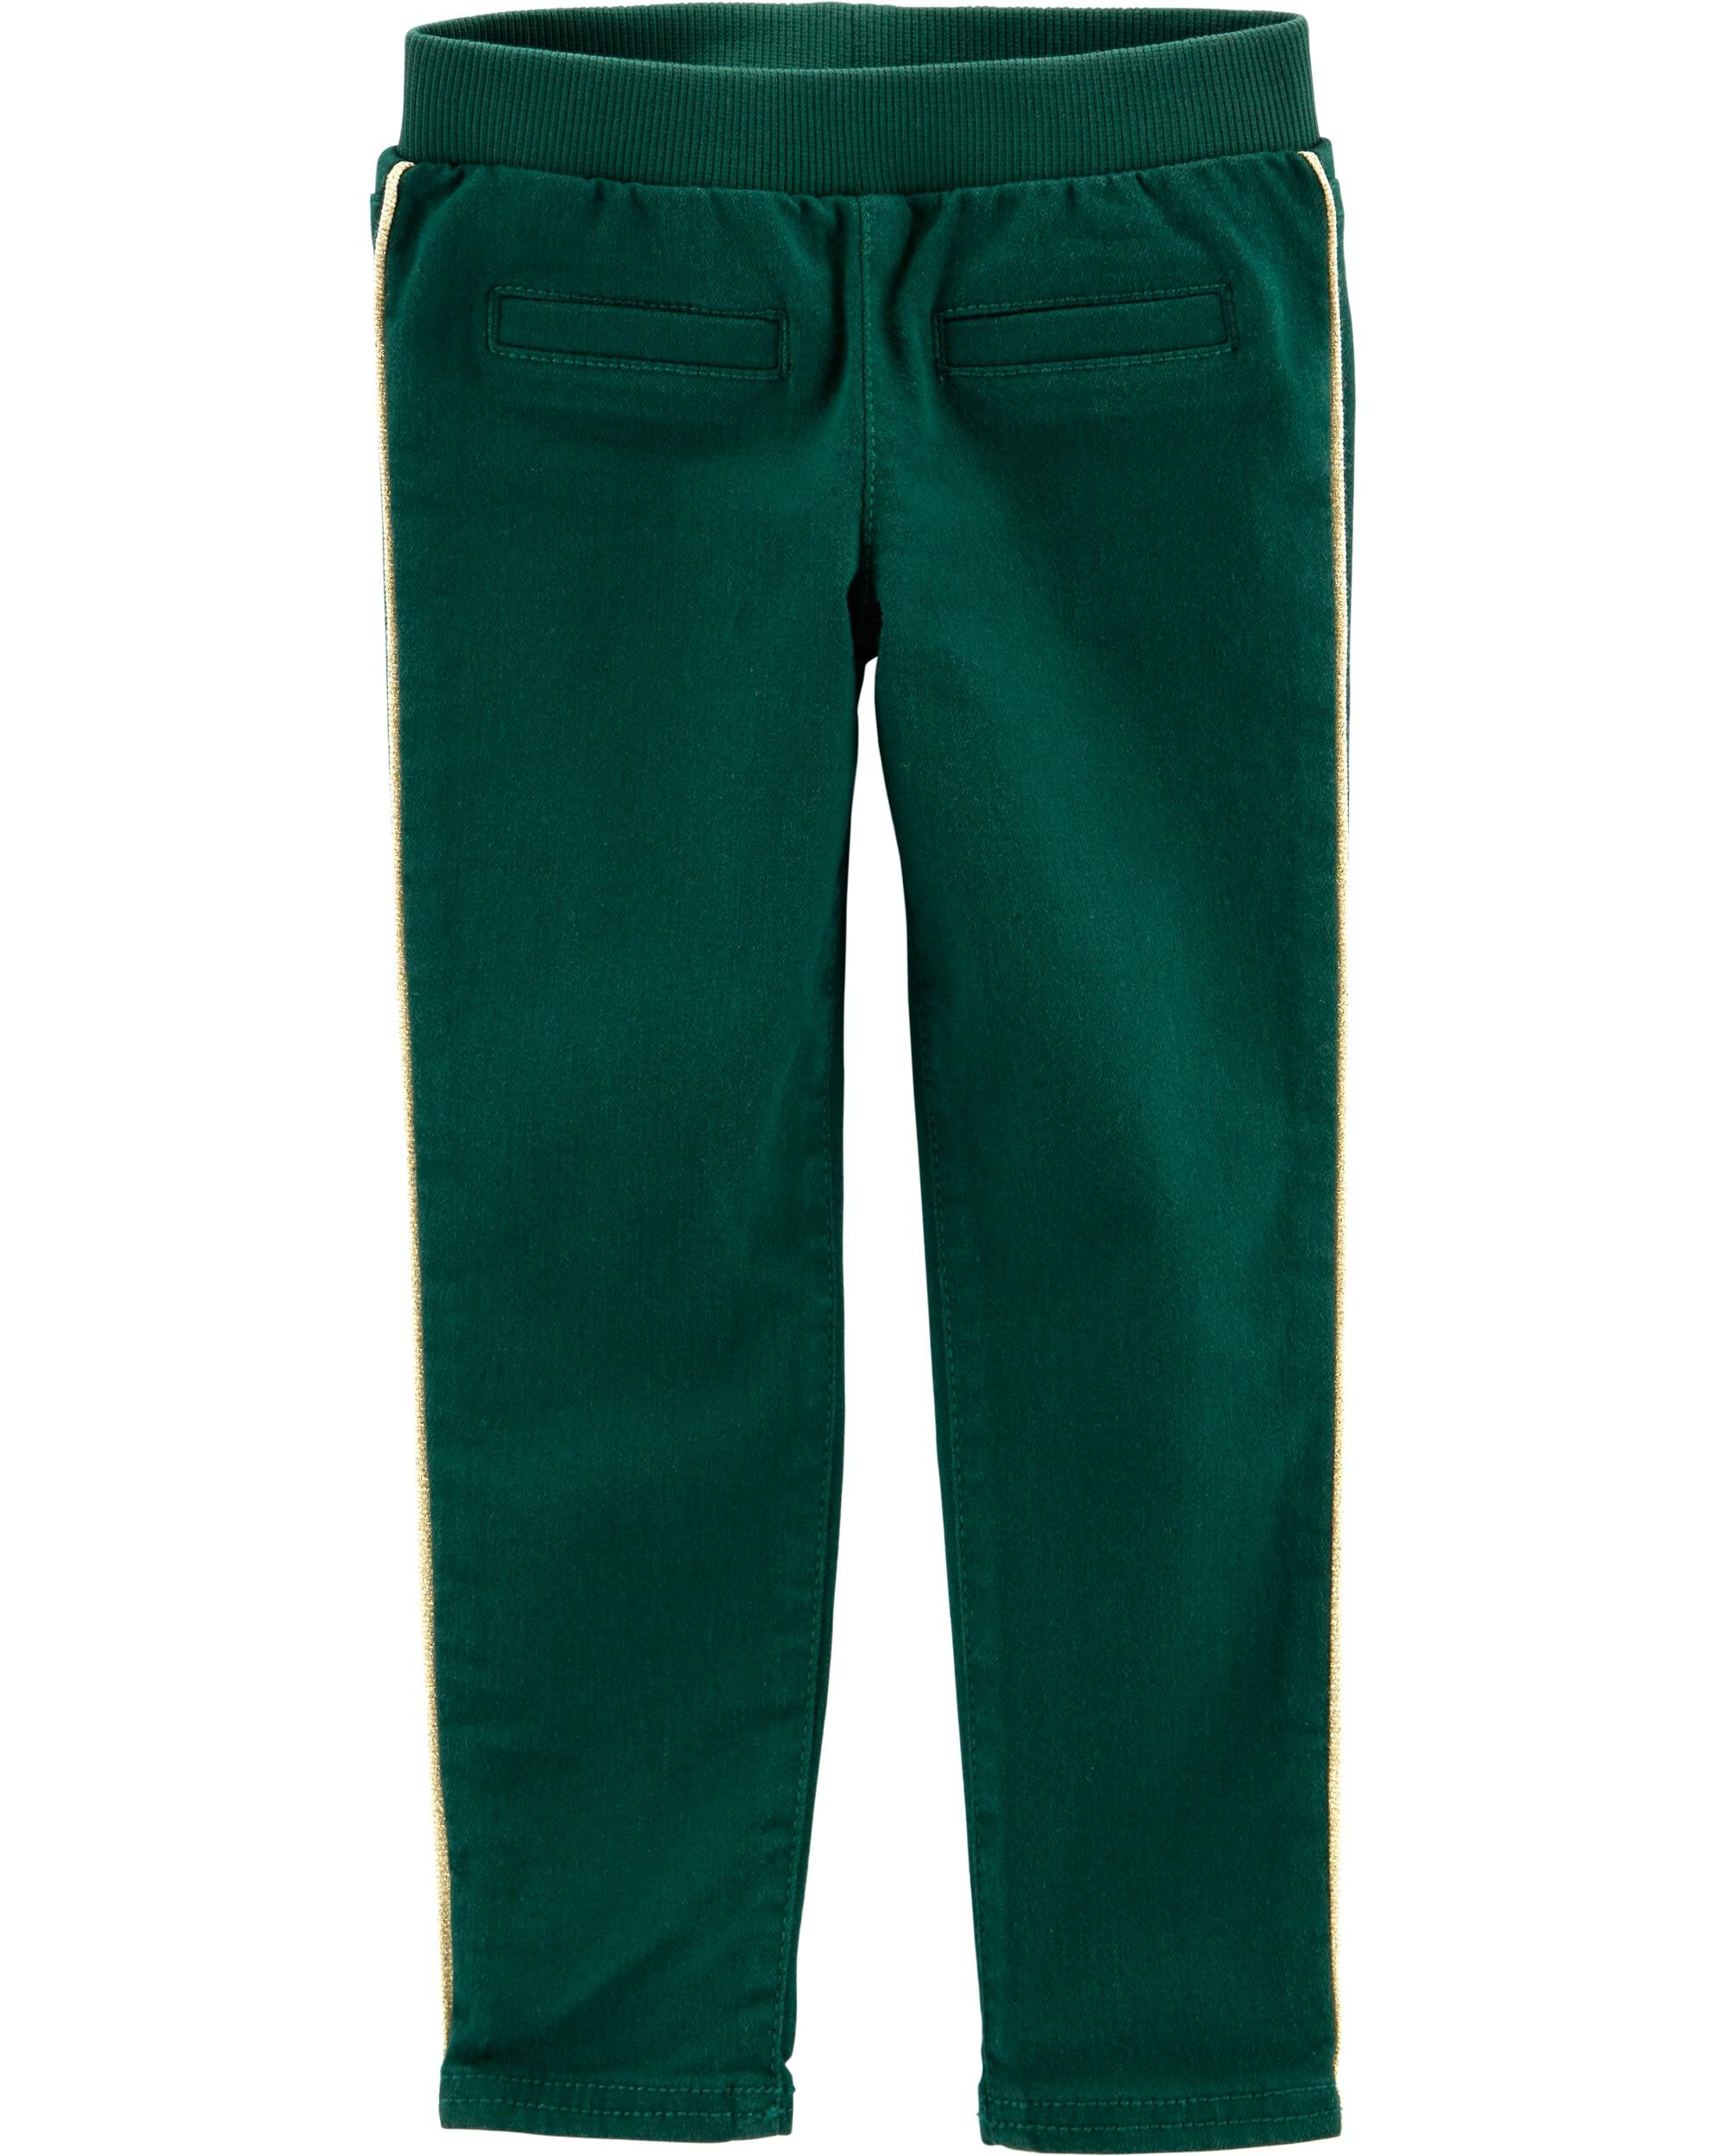 767663e77 Pull-On Skinny Stretch Pants   Carters.com